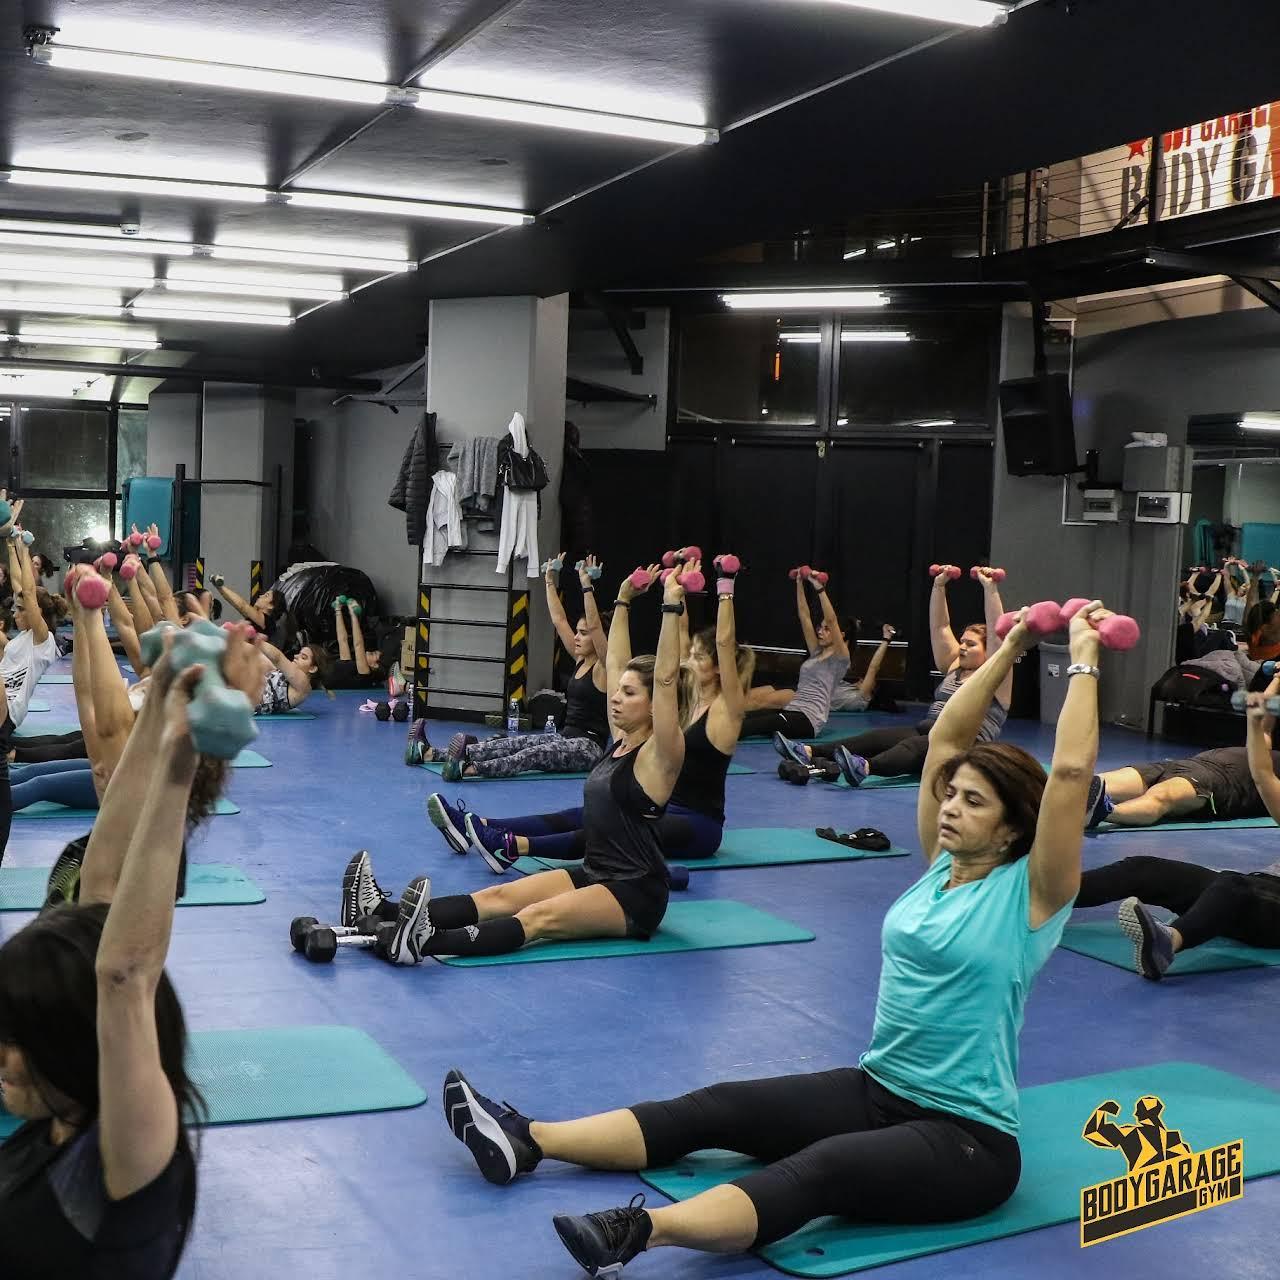 Bodygarage gym physical fitness program in beirut